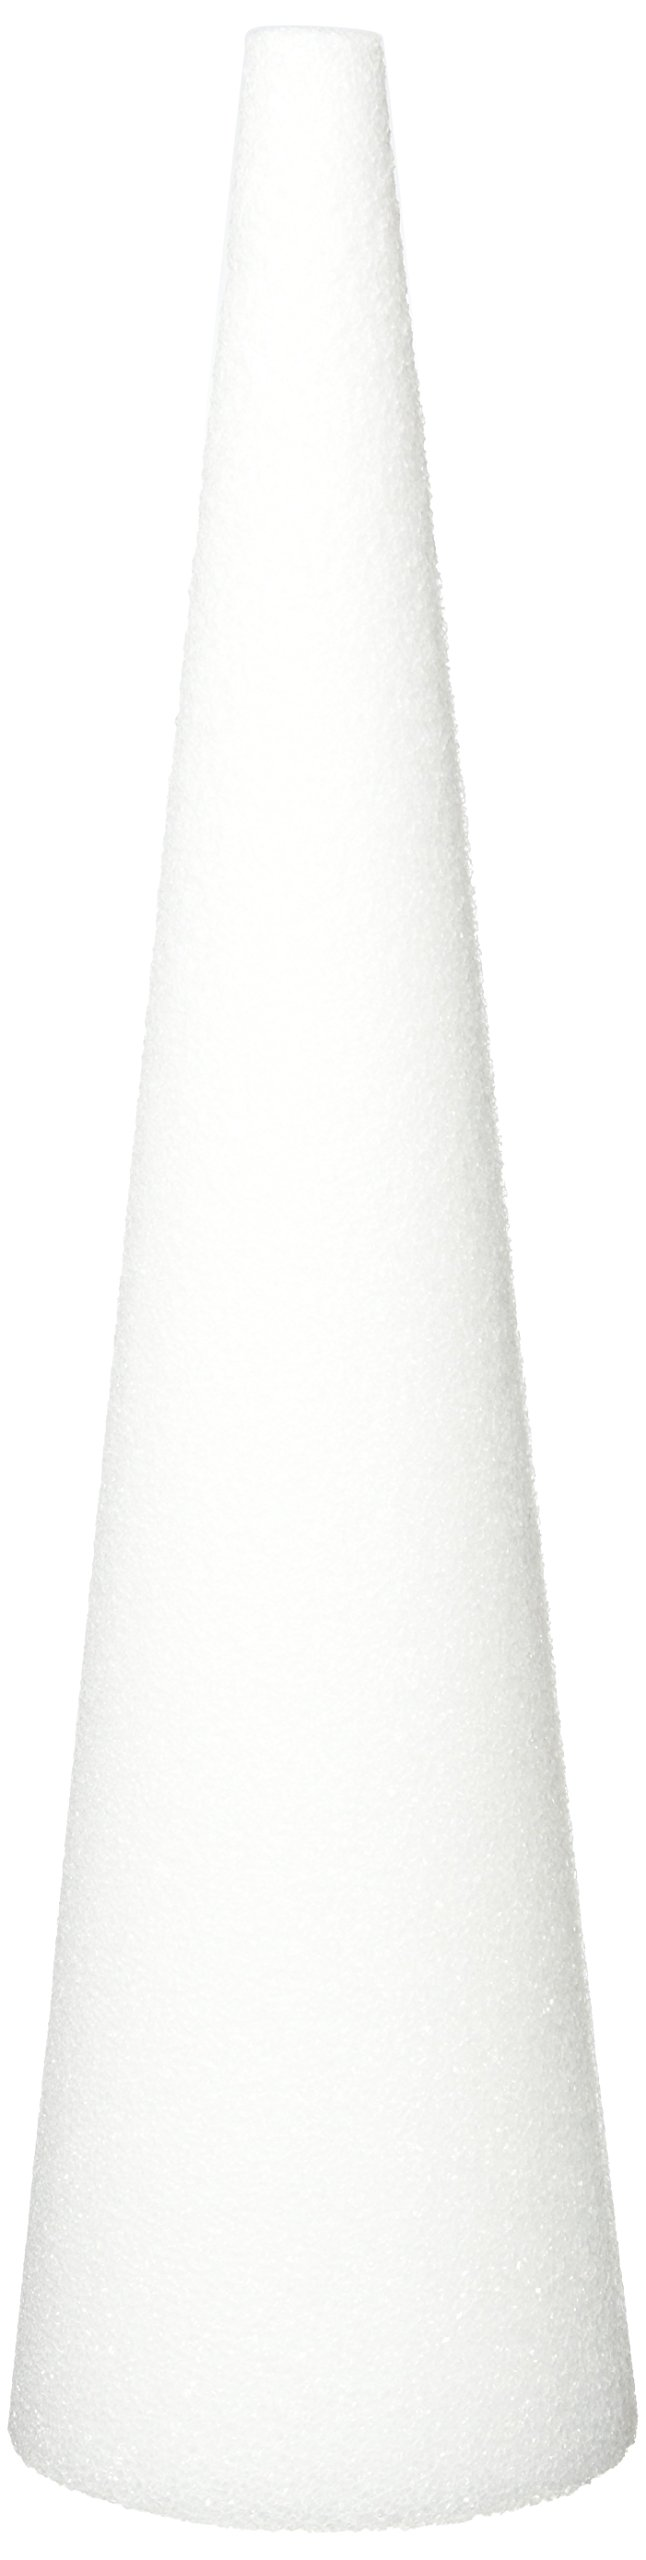 Floracraft FLOC185WB Cone White Styrofoam, 18'' by 5''